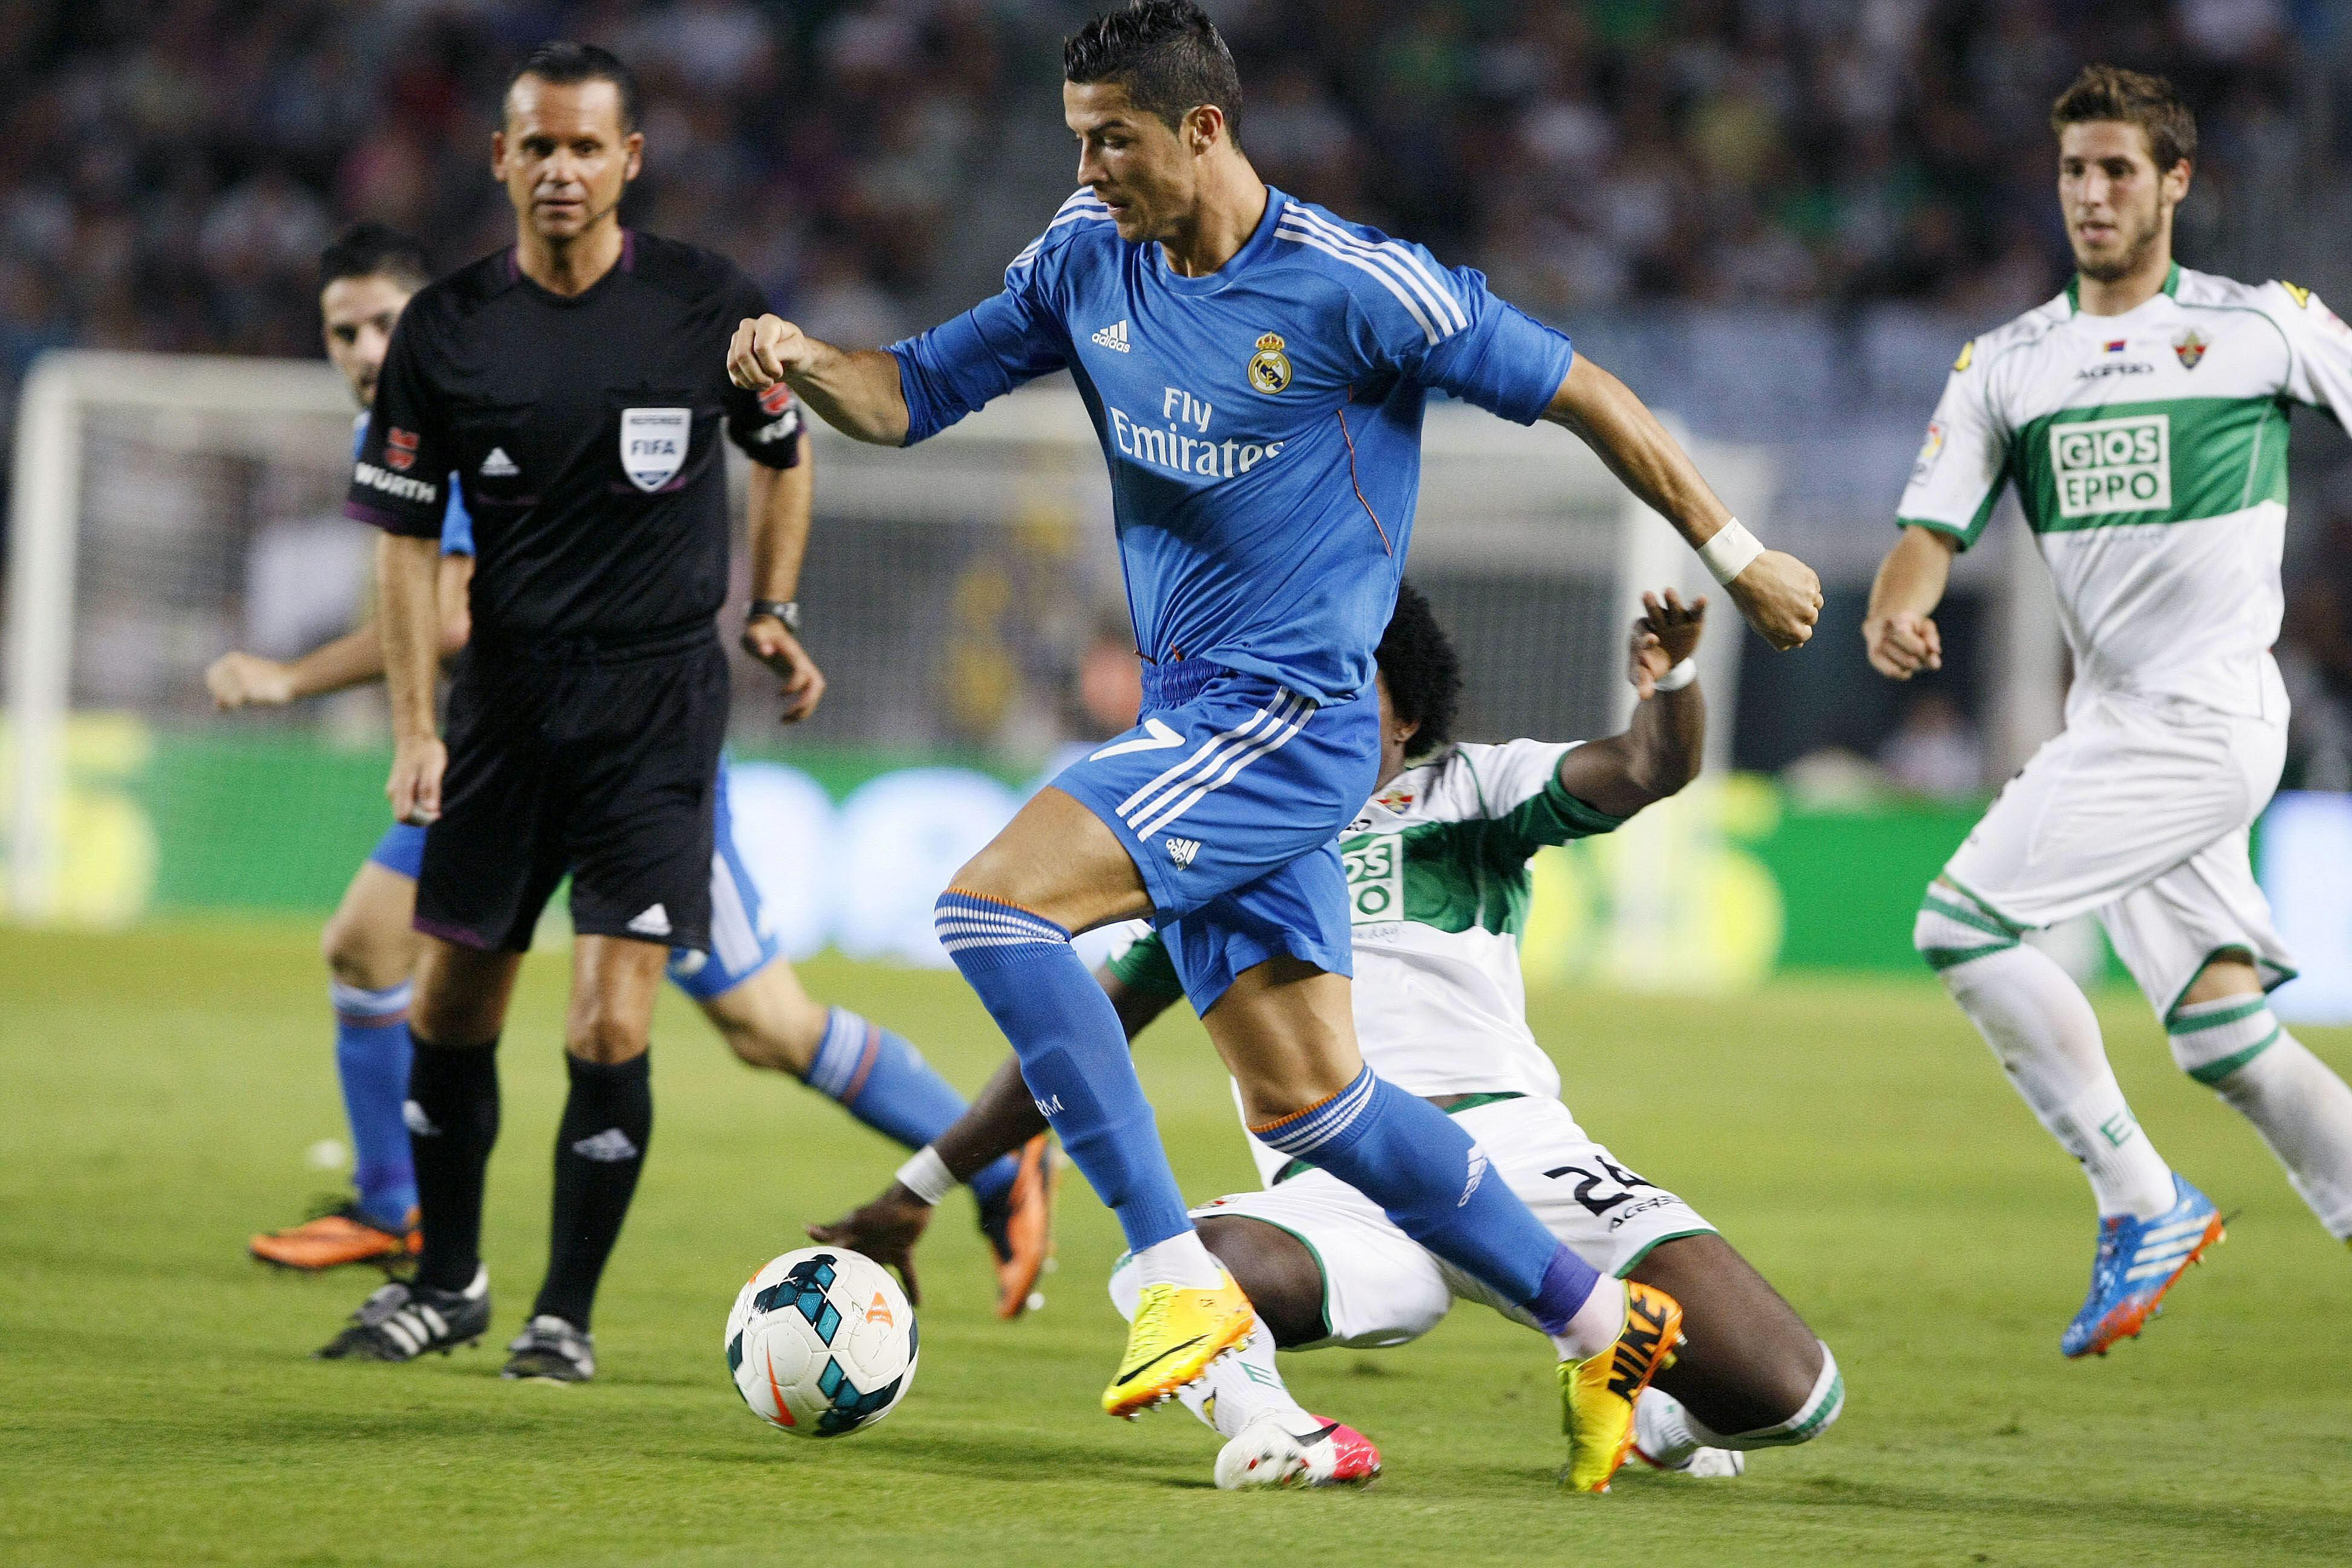 Match Real Madrid vs Elche en direct live streaming